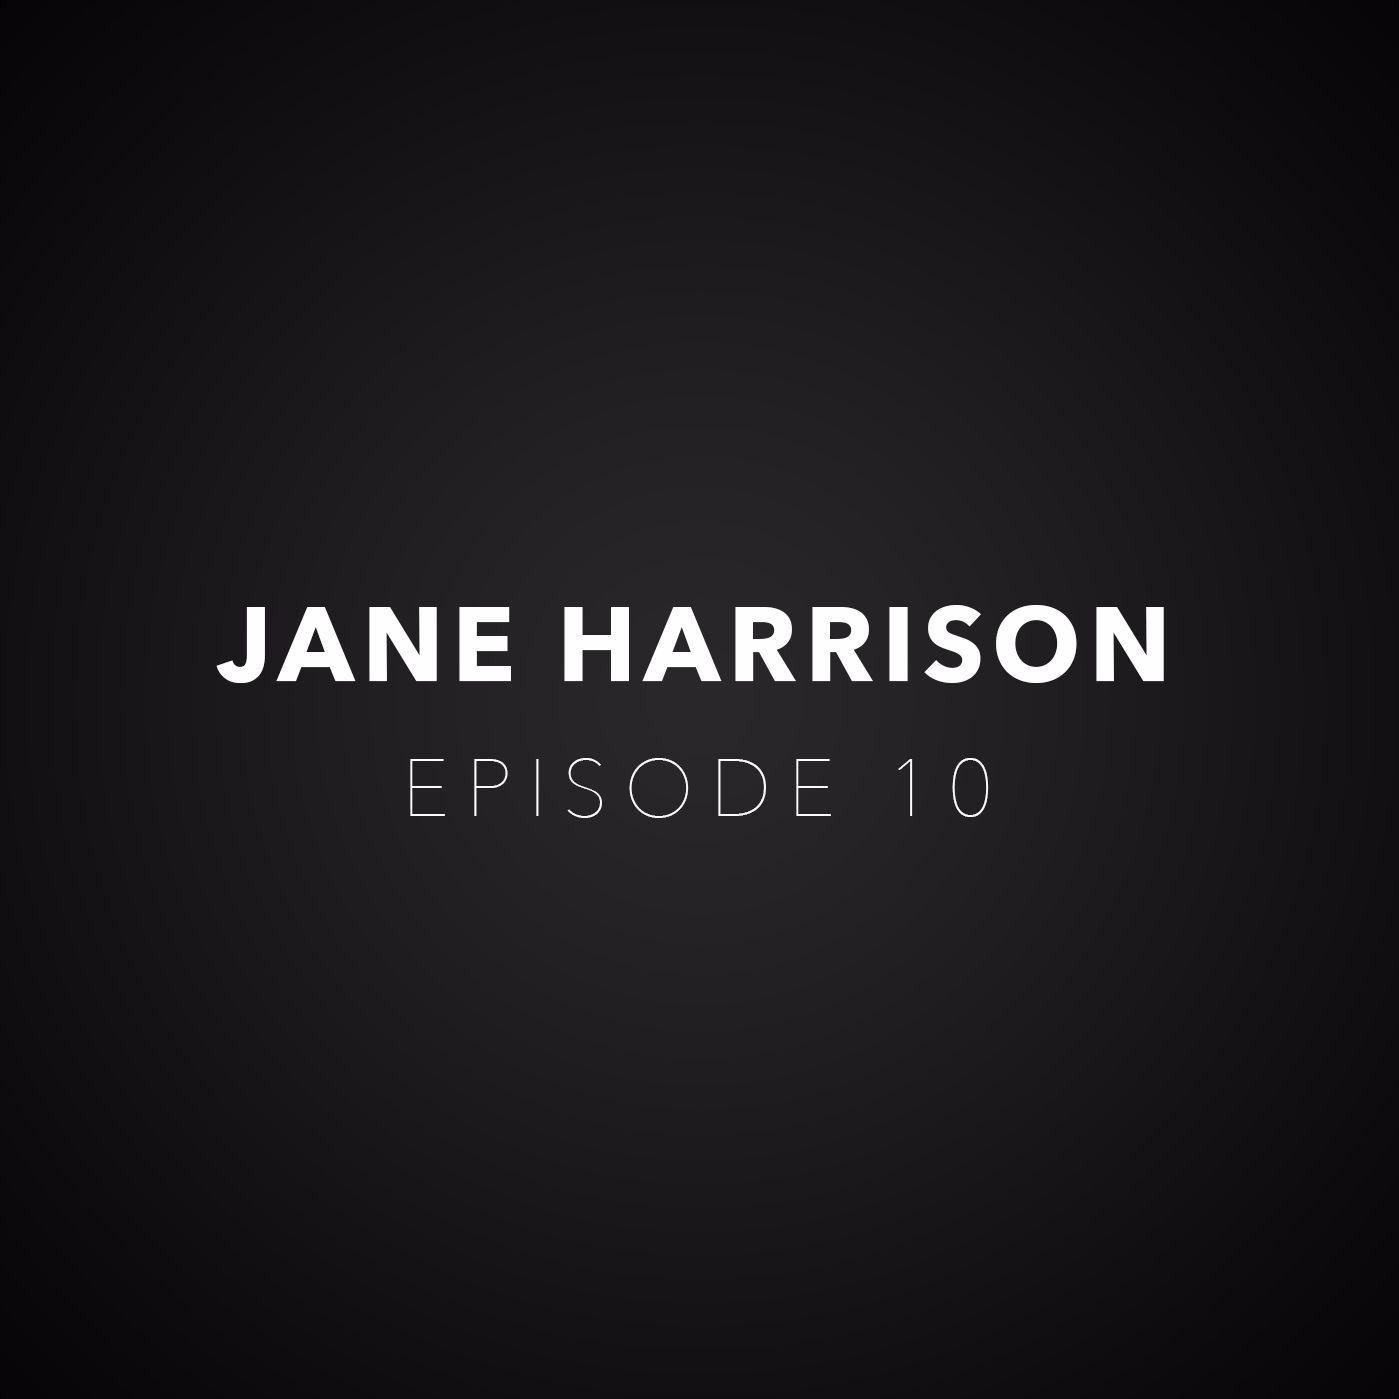 Episode 10 - Jane Harrison(Jessica Exposed)